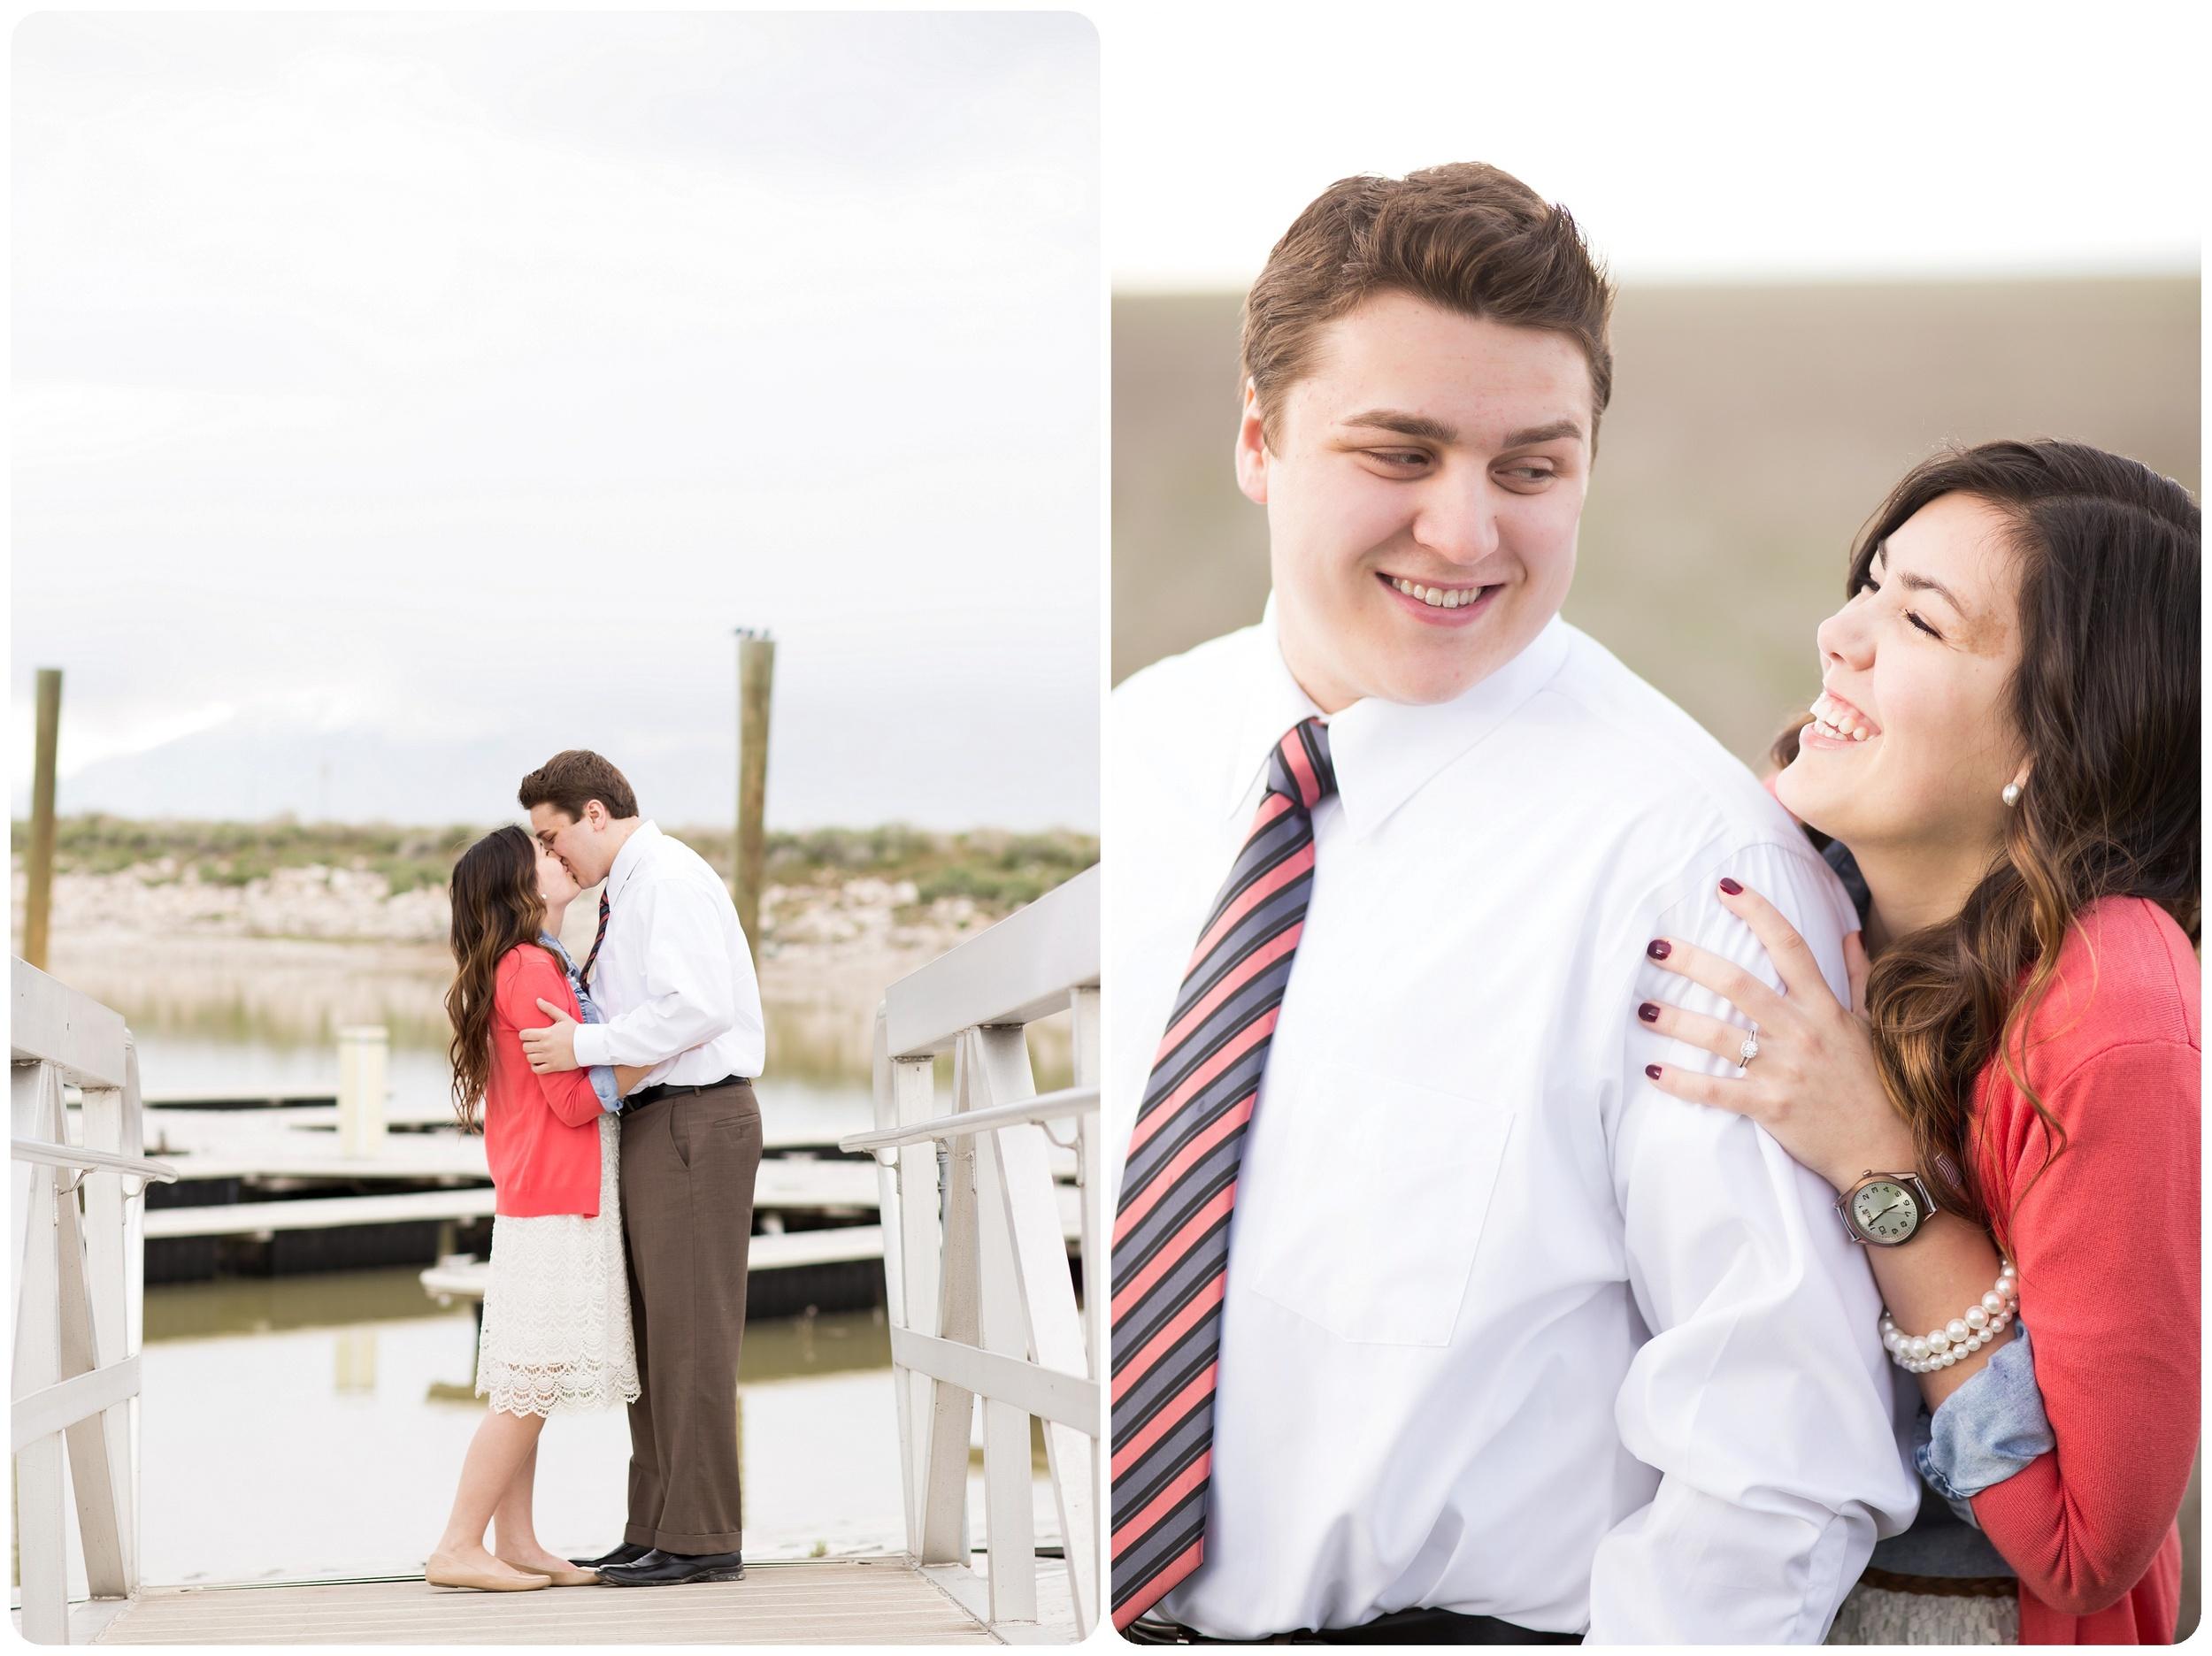 Rachel Lindsey Photography   Salt Lake City, UT   Engagements & Wedding Photographer   Antelope Island